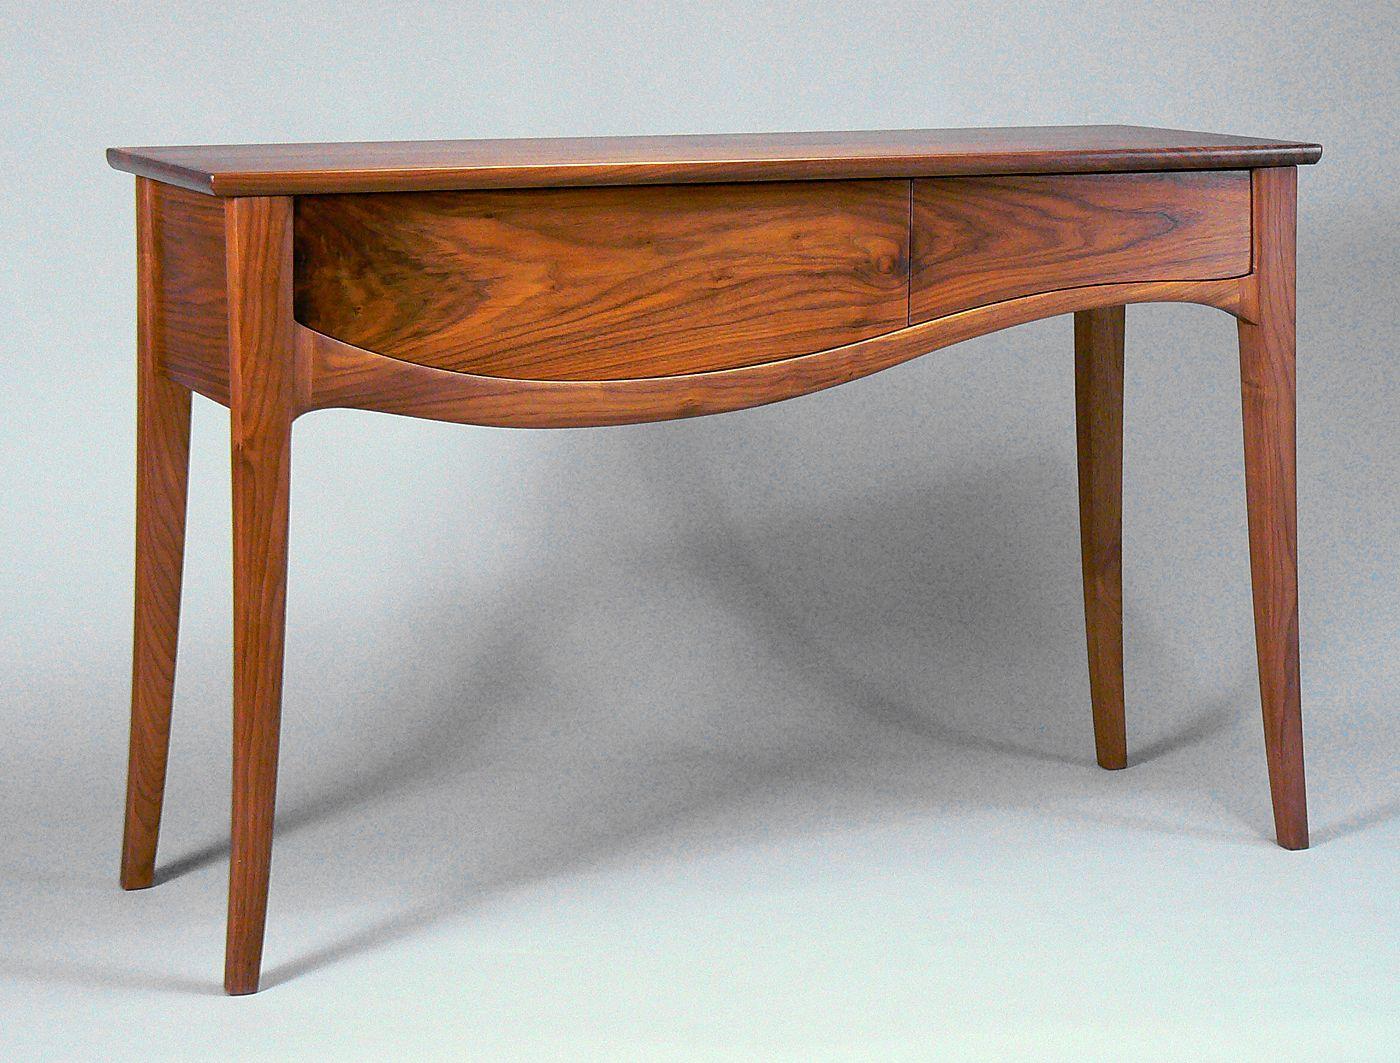 Funky Hall Tables ariel hall table - greg klassen furniture   eire   pinterest